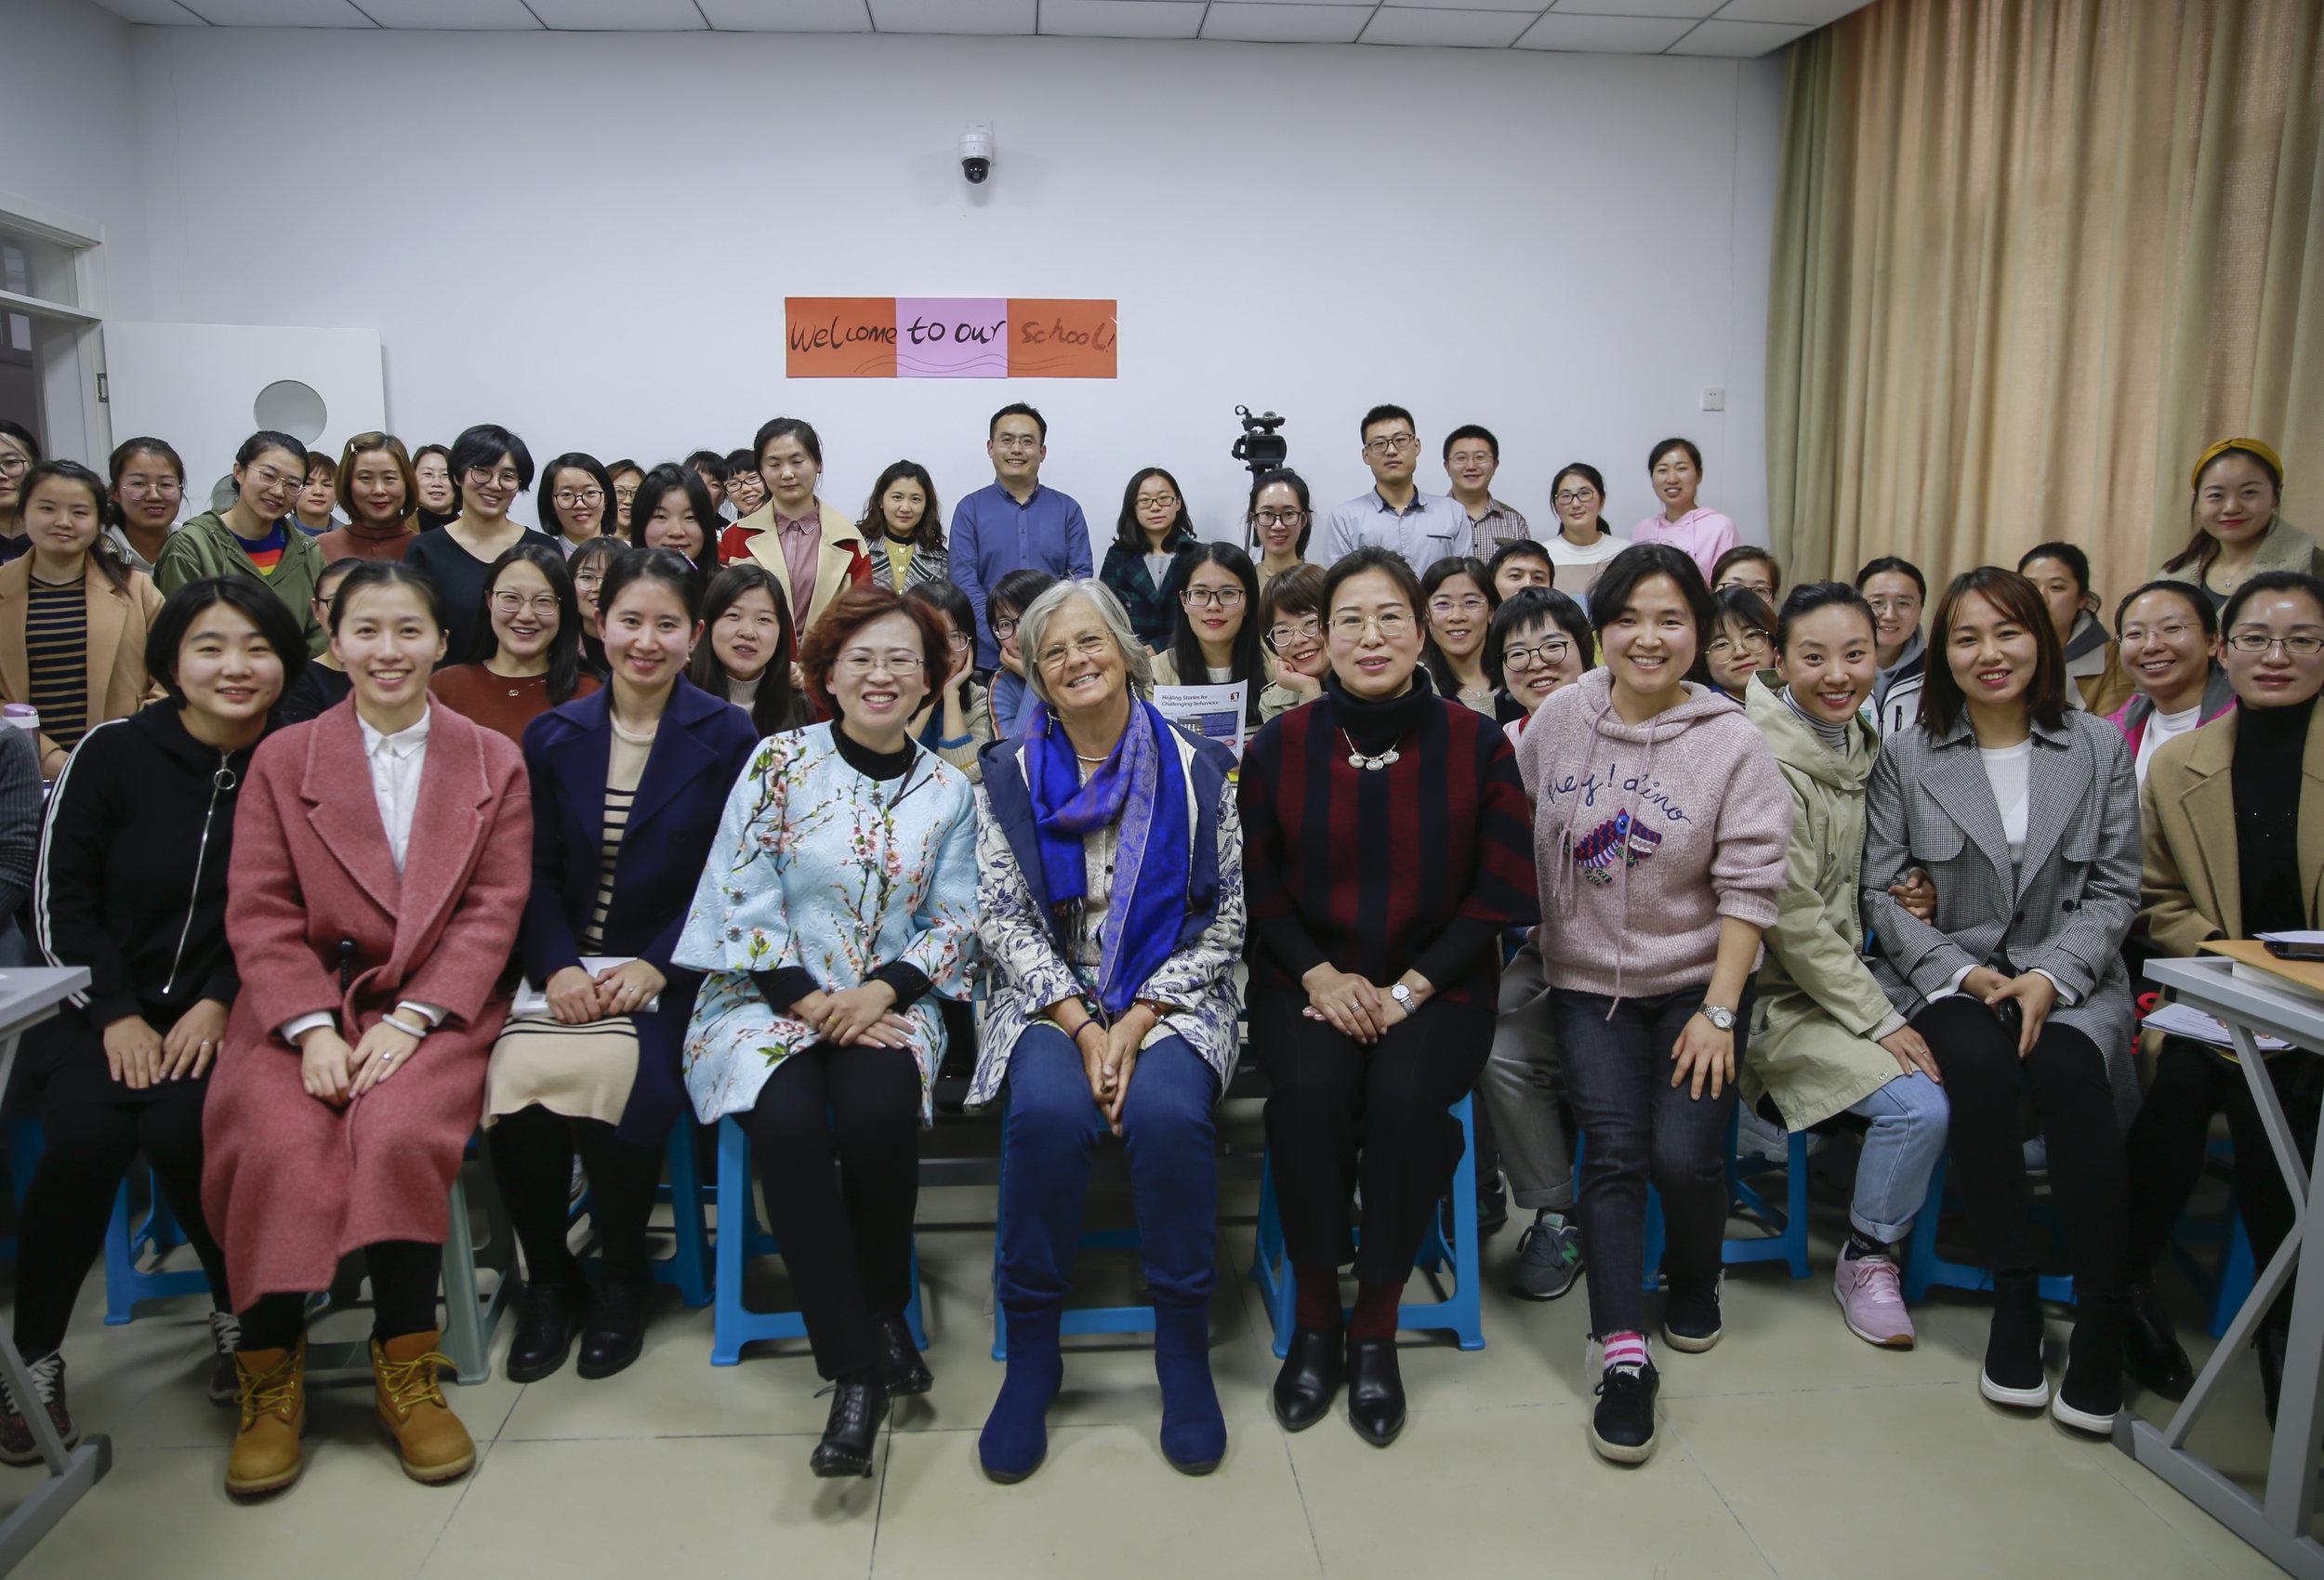 Workshop for 60 grade teachers (classes 4,5,6) in Beijing, March 2019